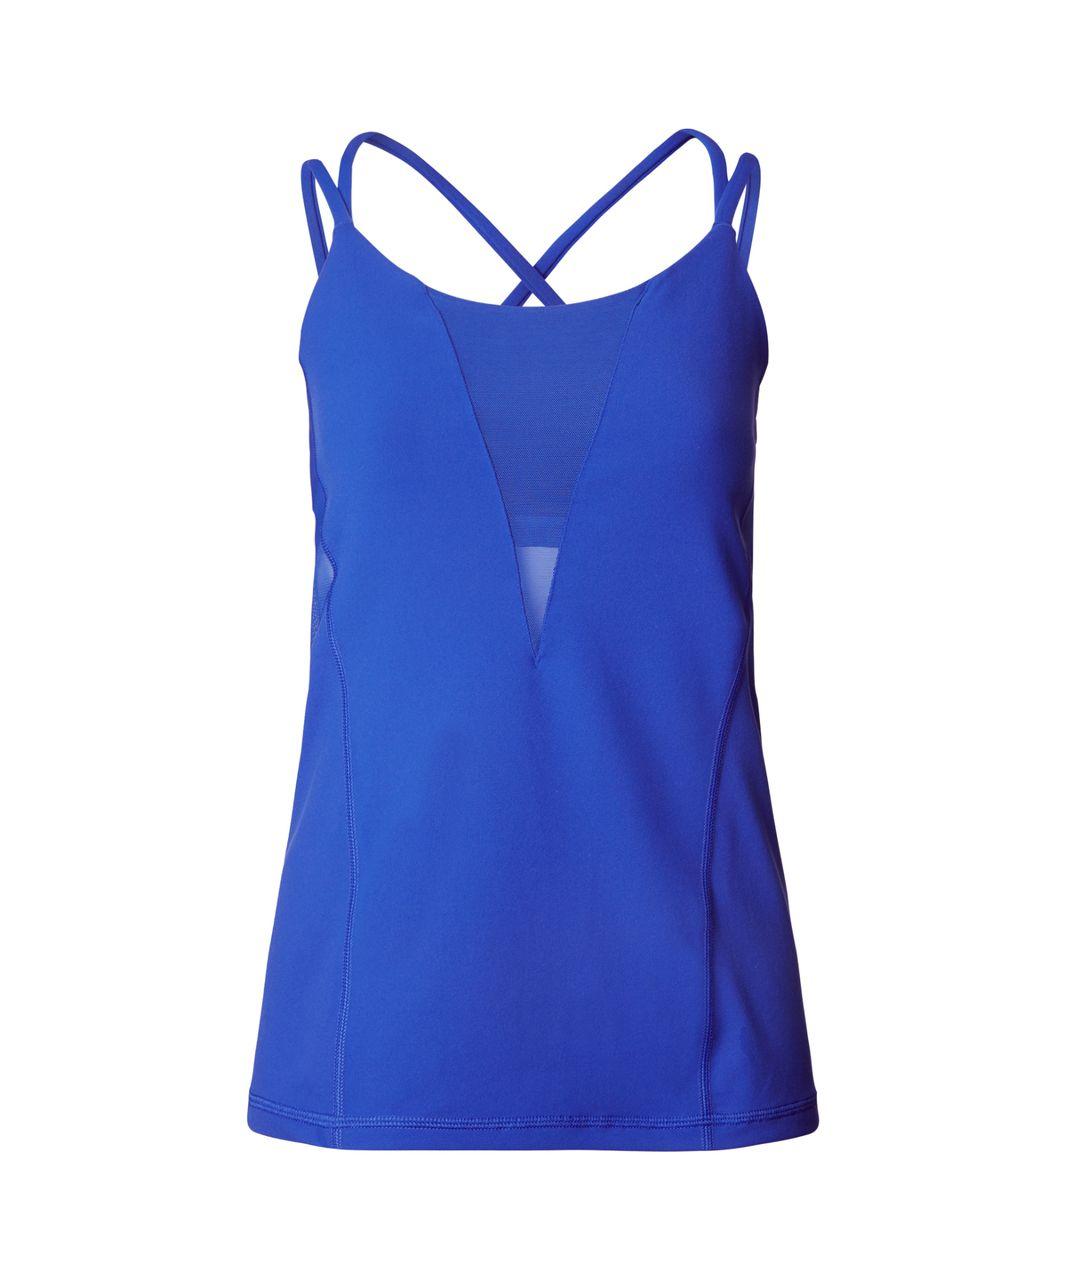 Lululemon Exquisite Tank - Sapphire Blue